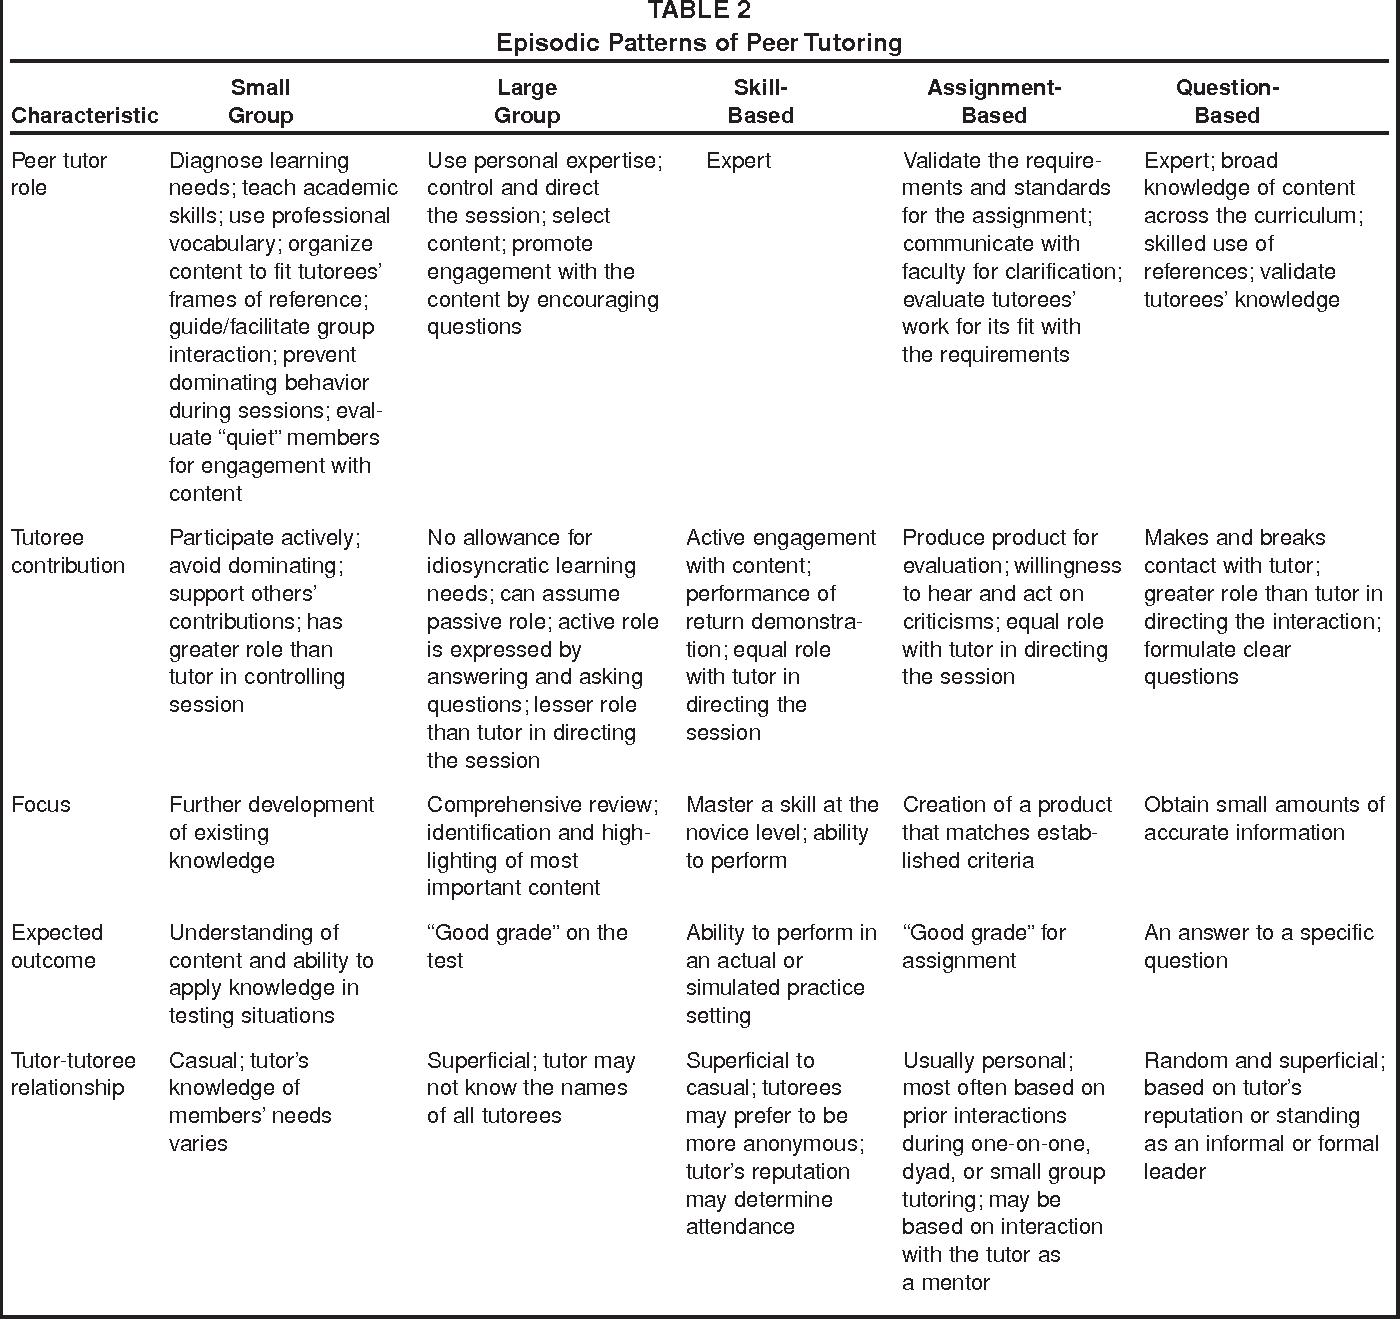 PDF] Patterns of peer tutoring in nursing  - Semantic Scholar